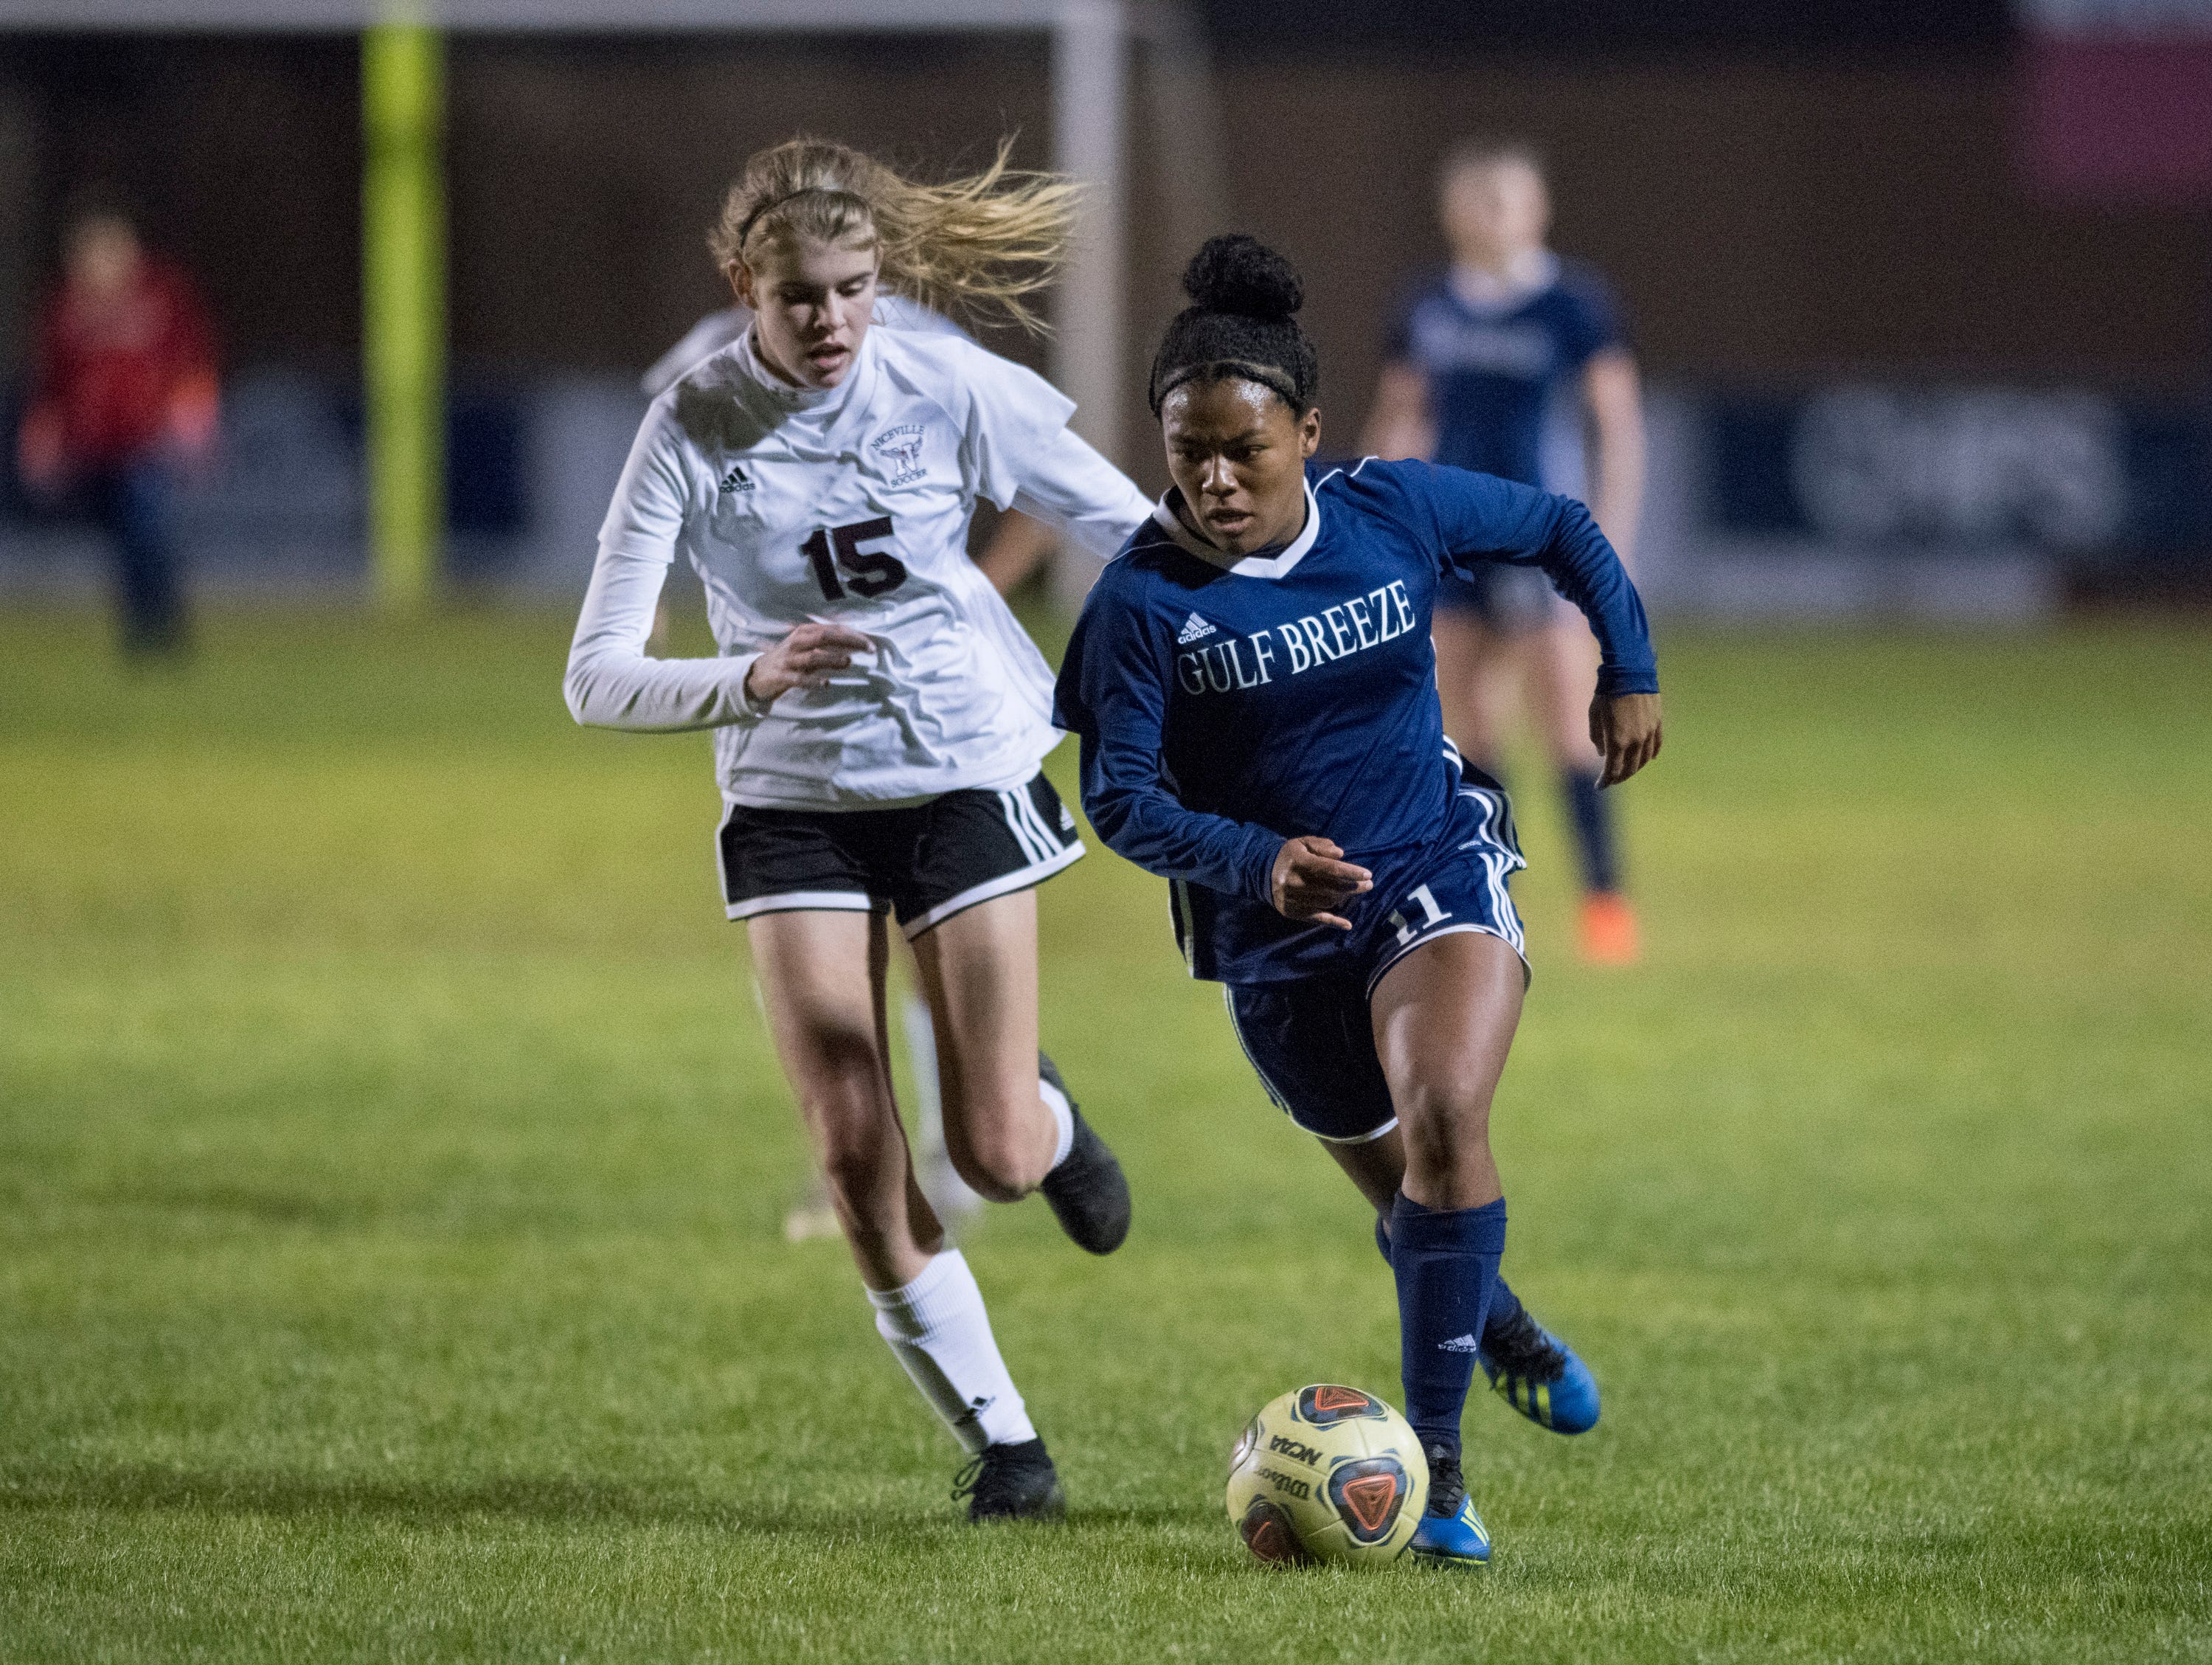 Mya Swinton (11) races past Haley Shelton (15) during the Niceville vs Gulf Breeze soccer game at Gulf Breeze High School on Thursday, January 10, 2019.